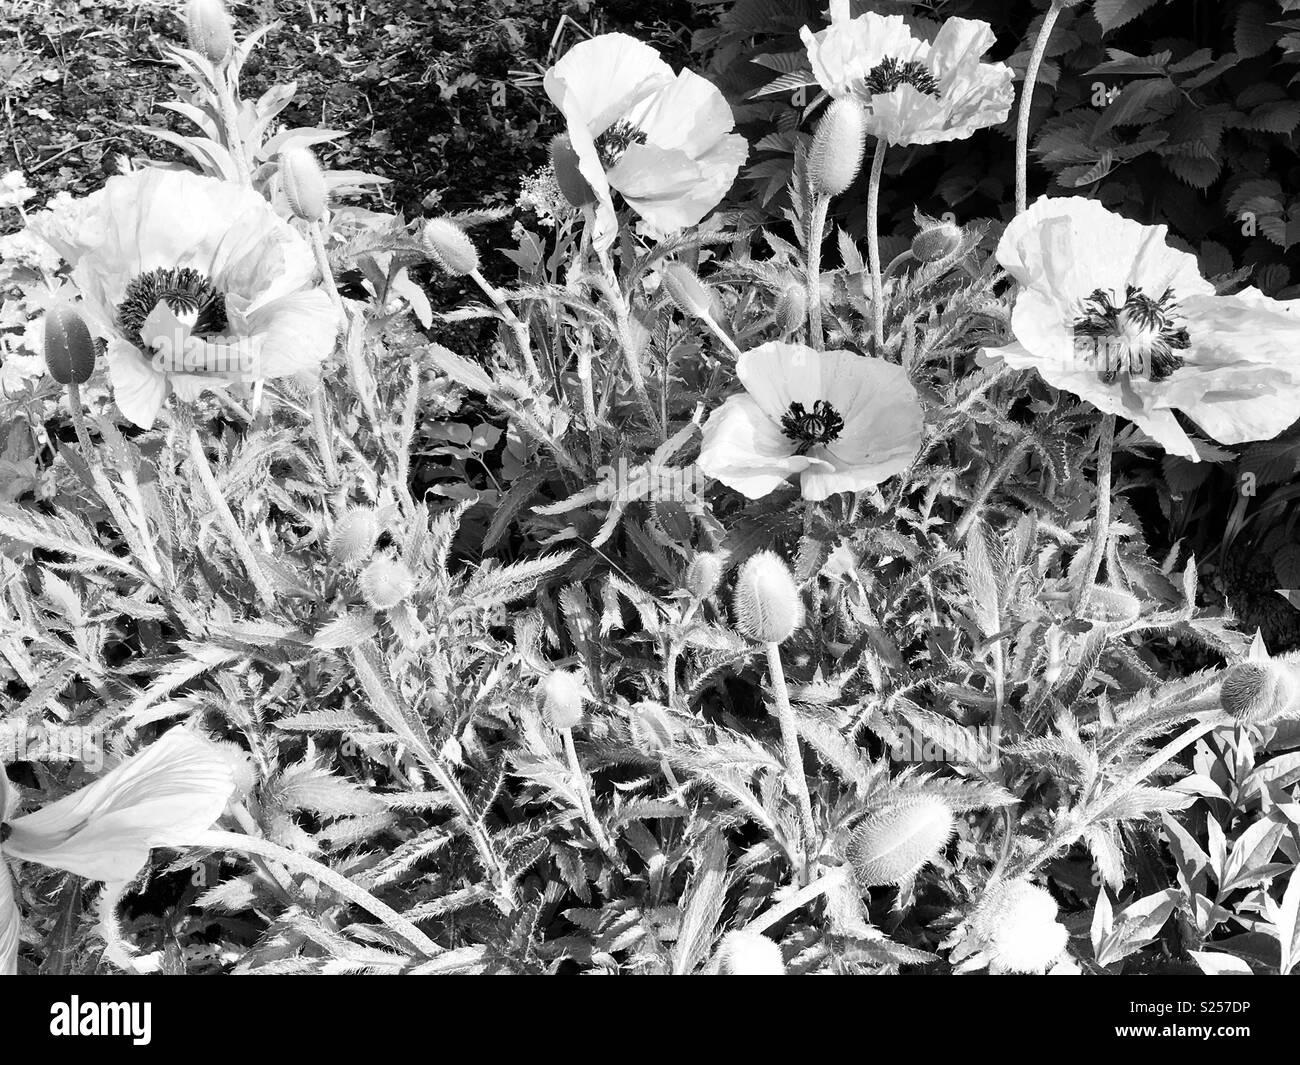 Black And White Poppies Stock Photos Black And White Poppies